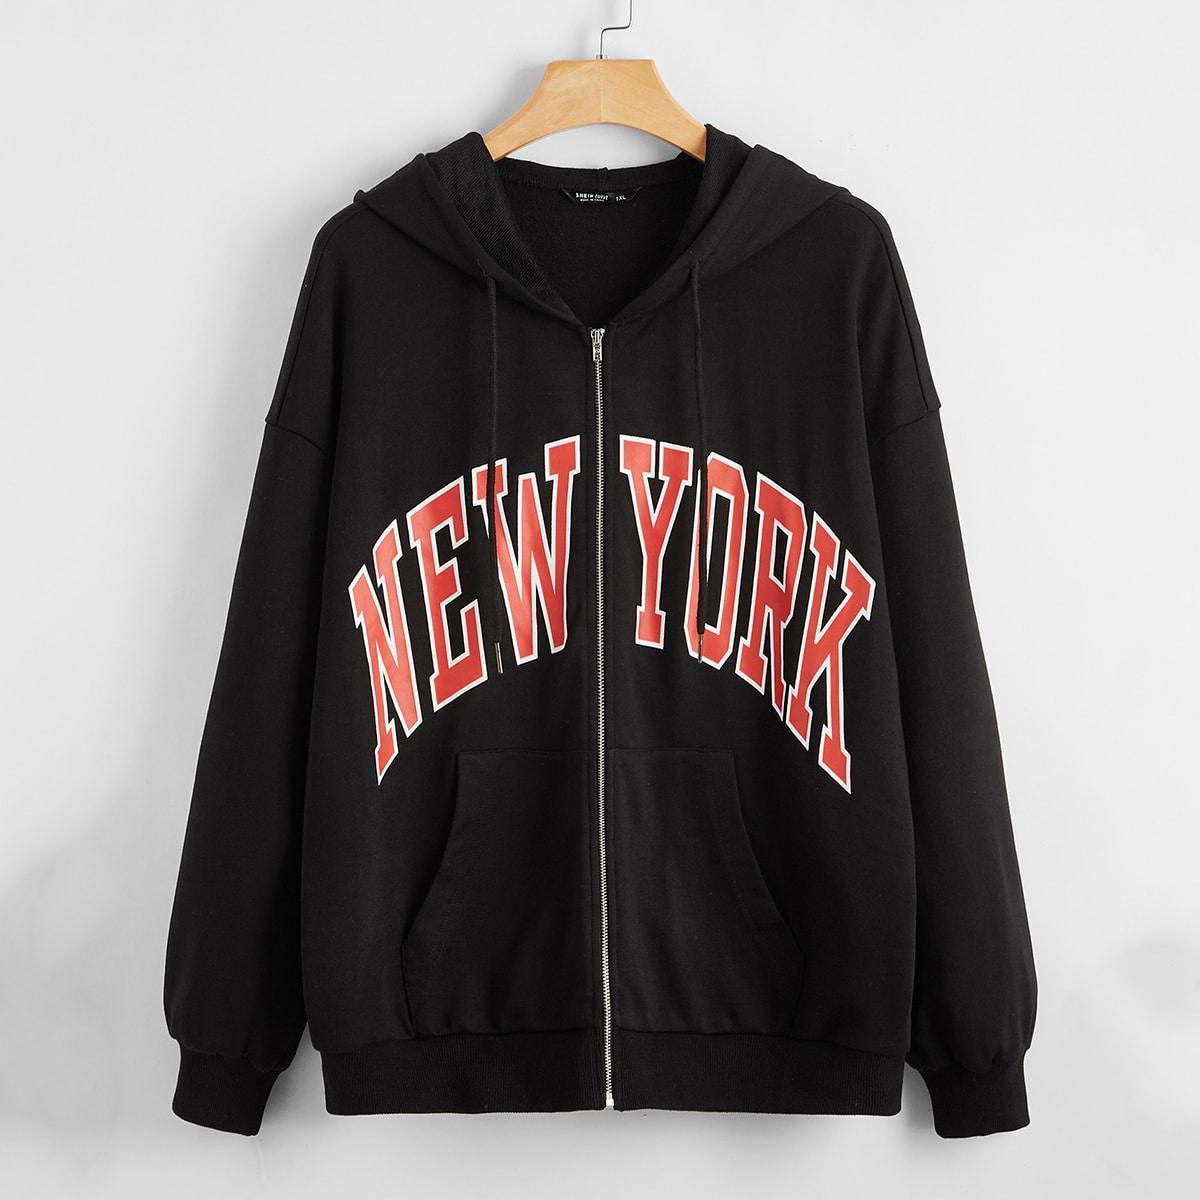 SHEIN / Plus Drop Shoulder Letter Graphic Zipper Placket Hooded Sweatshirt